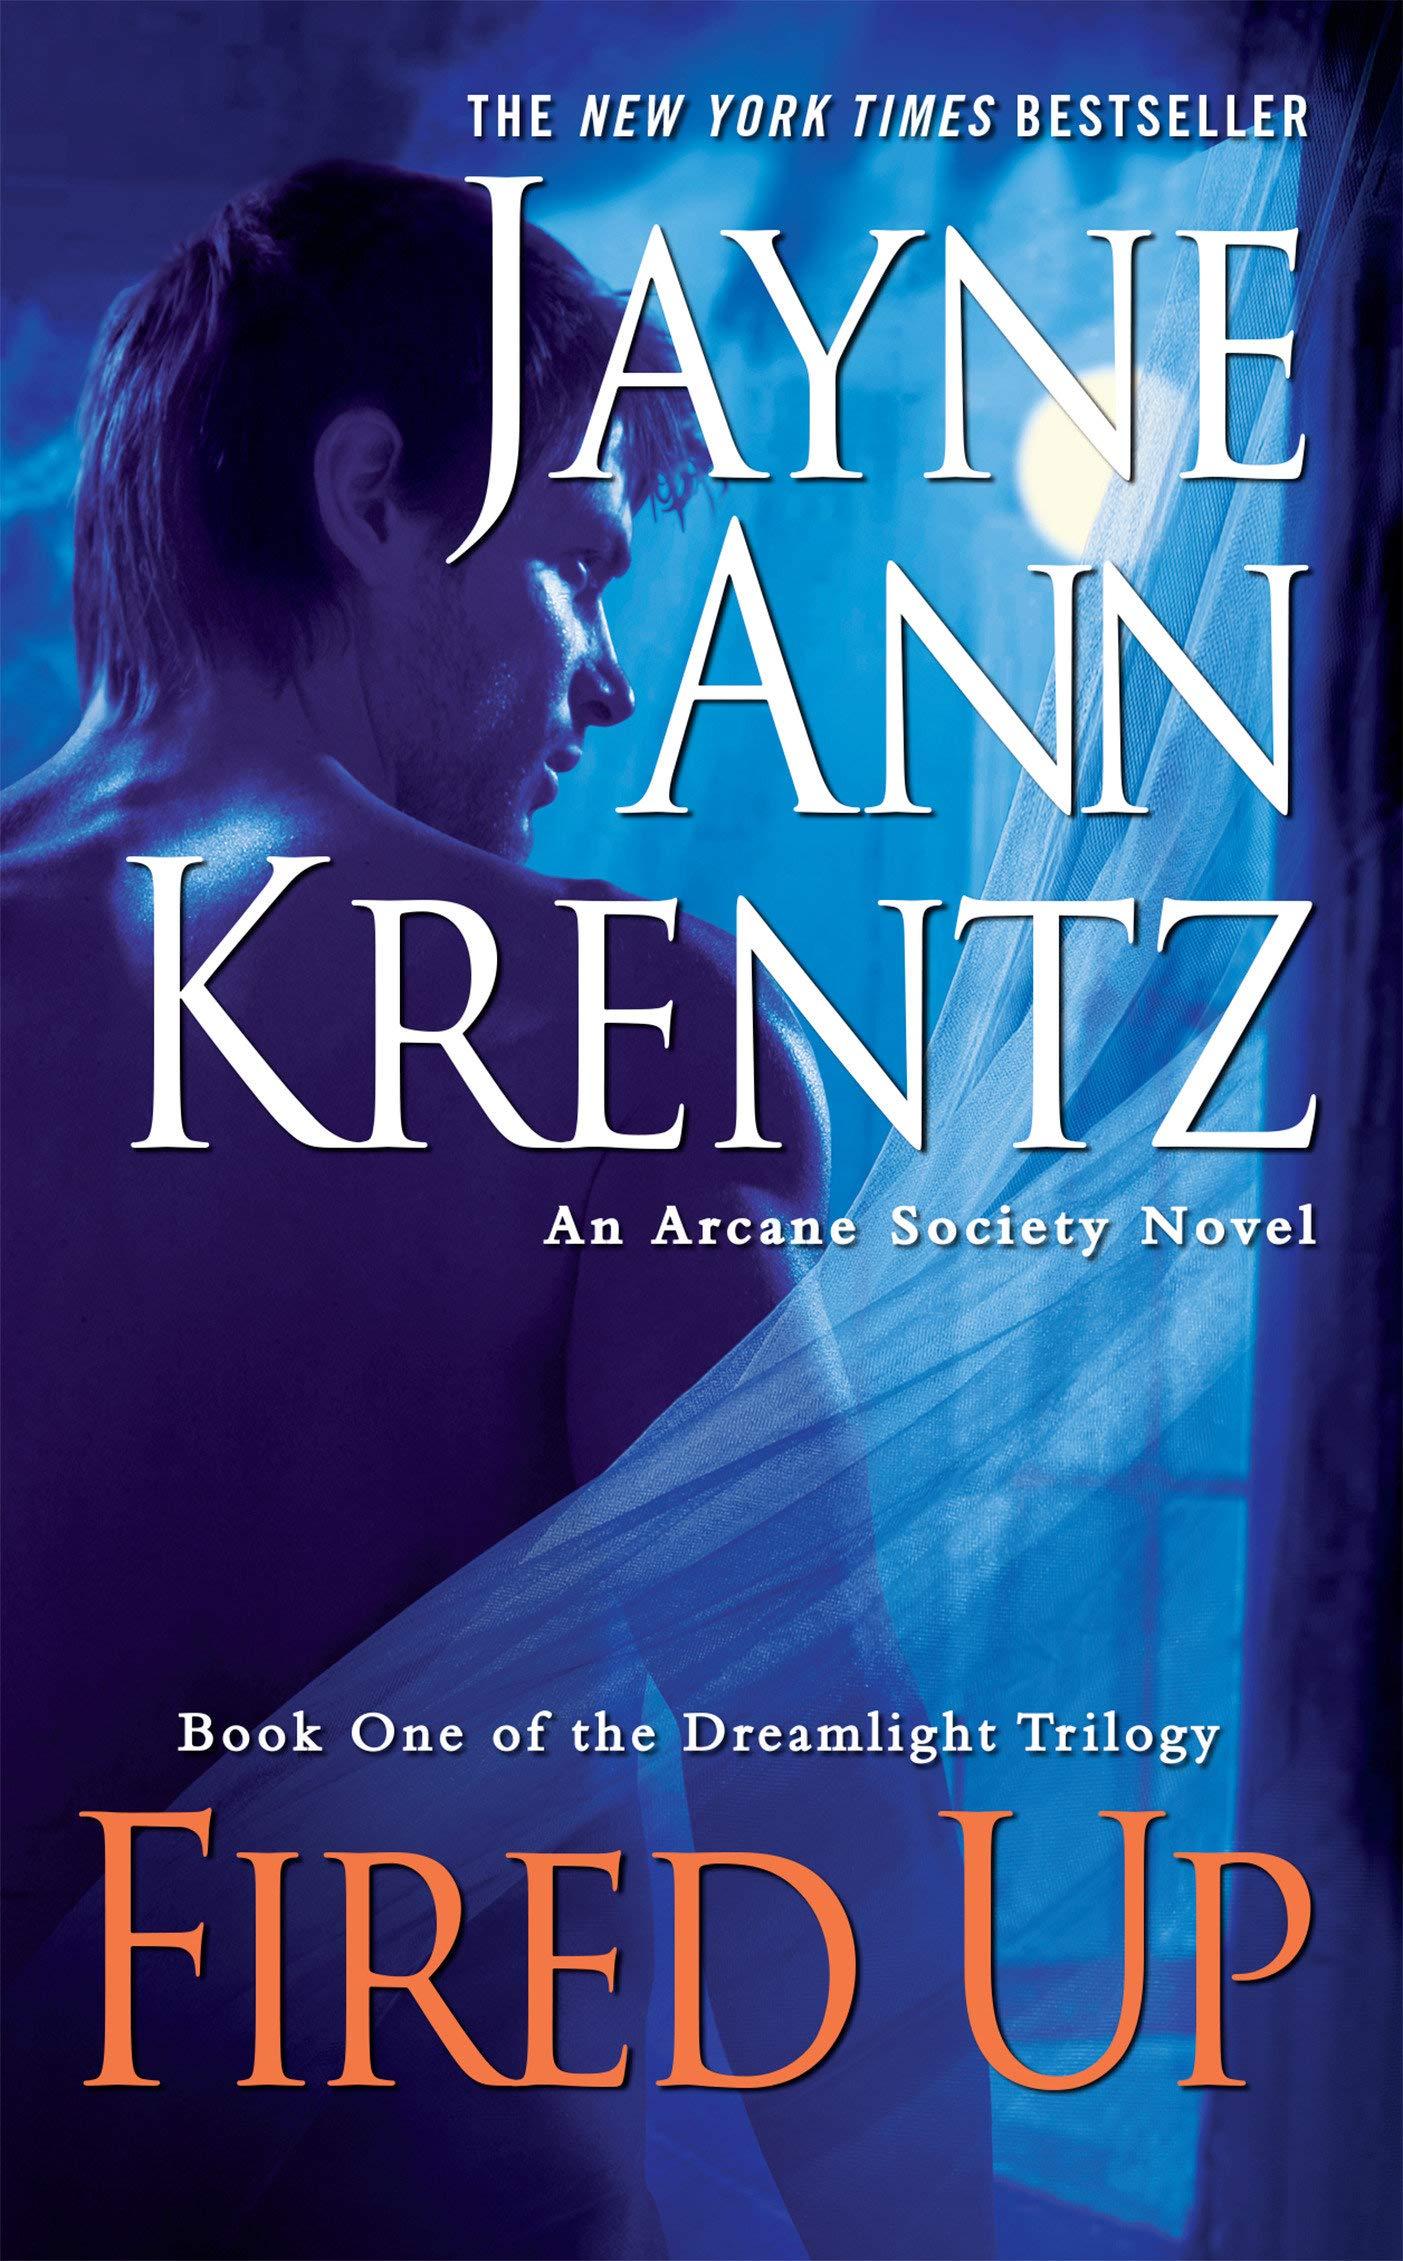 Amazon.com: Fired Up: Book One in the Dreamlight Trilogy (An Arcane Society  Novel) (9780515148787): Jayne Ann Krentz: Books